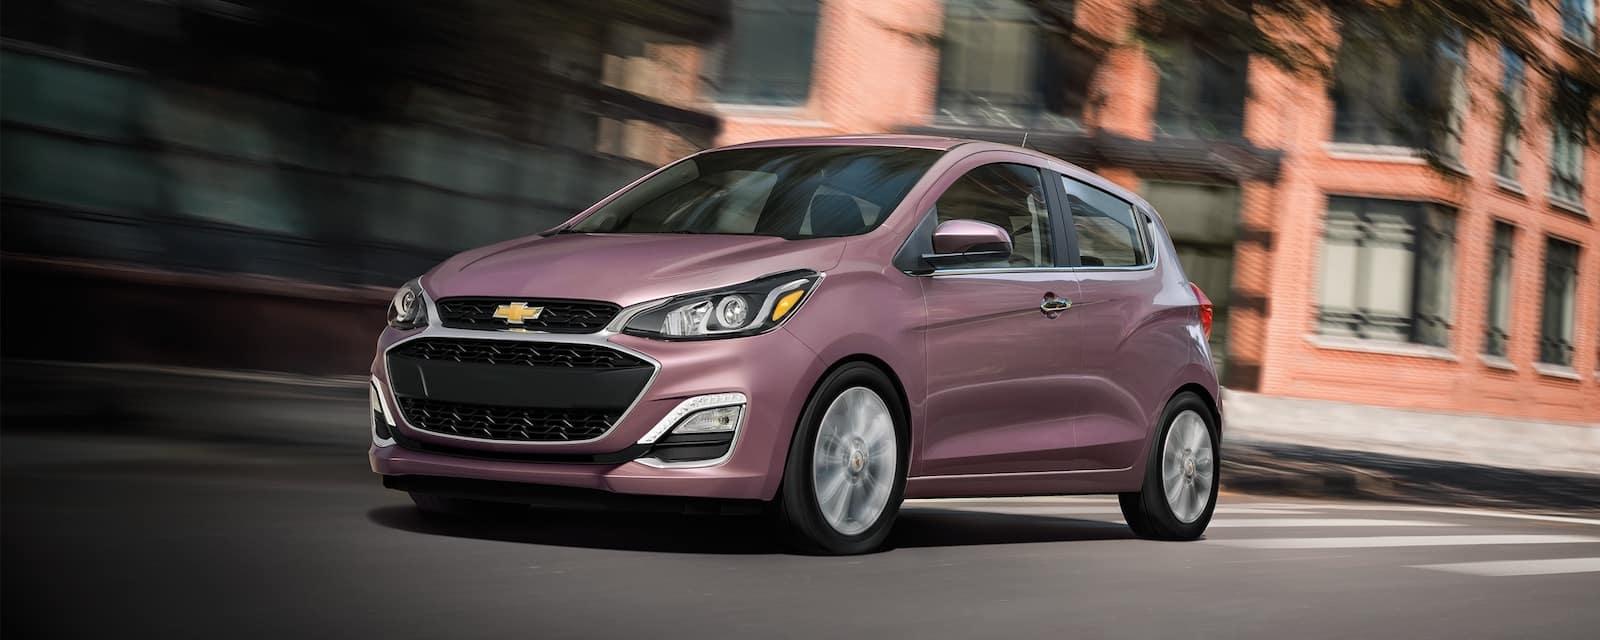 Chevrolet Spark Dealership